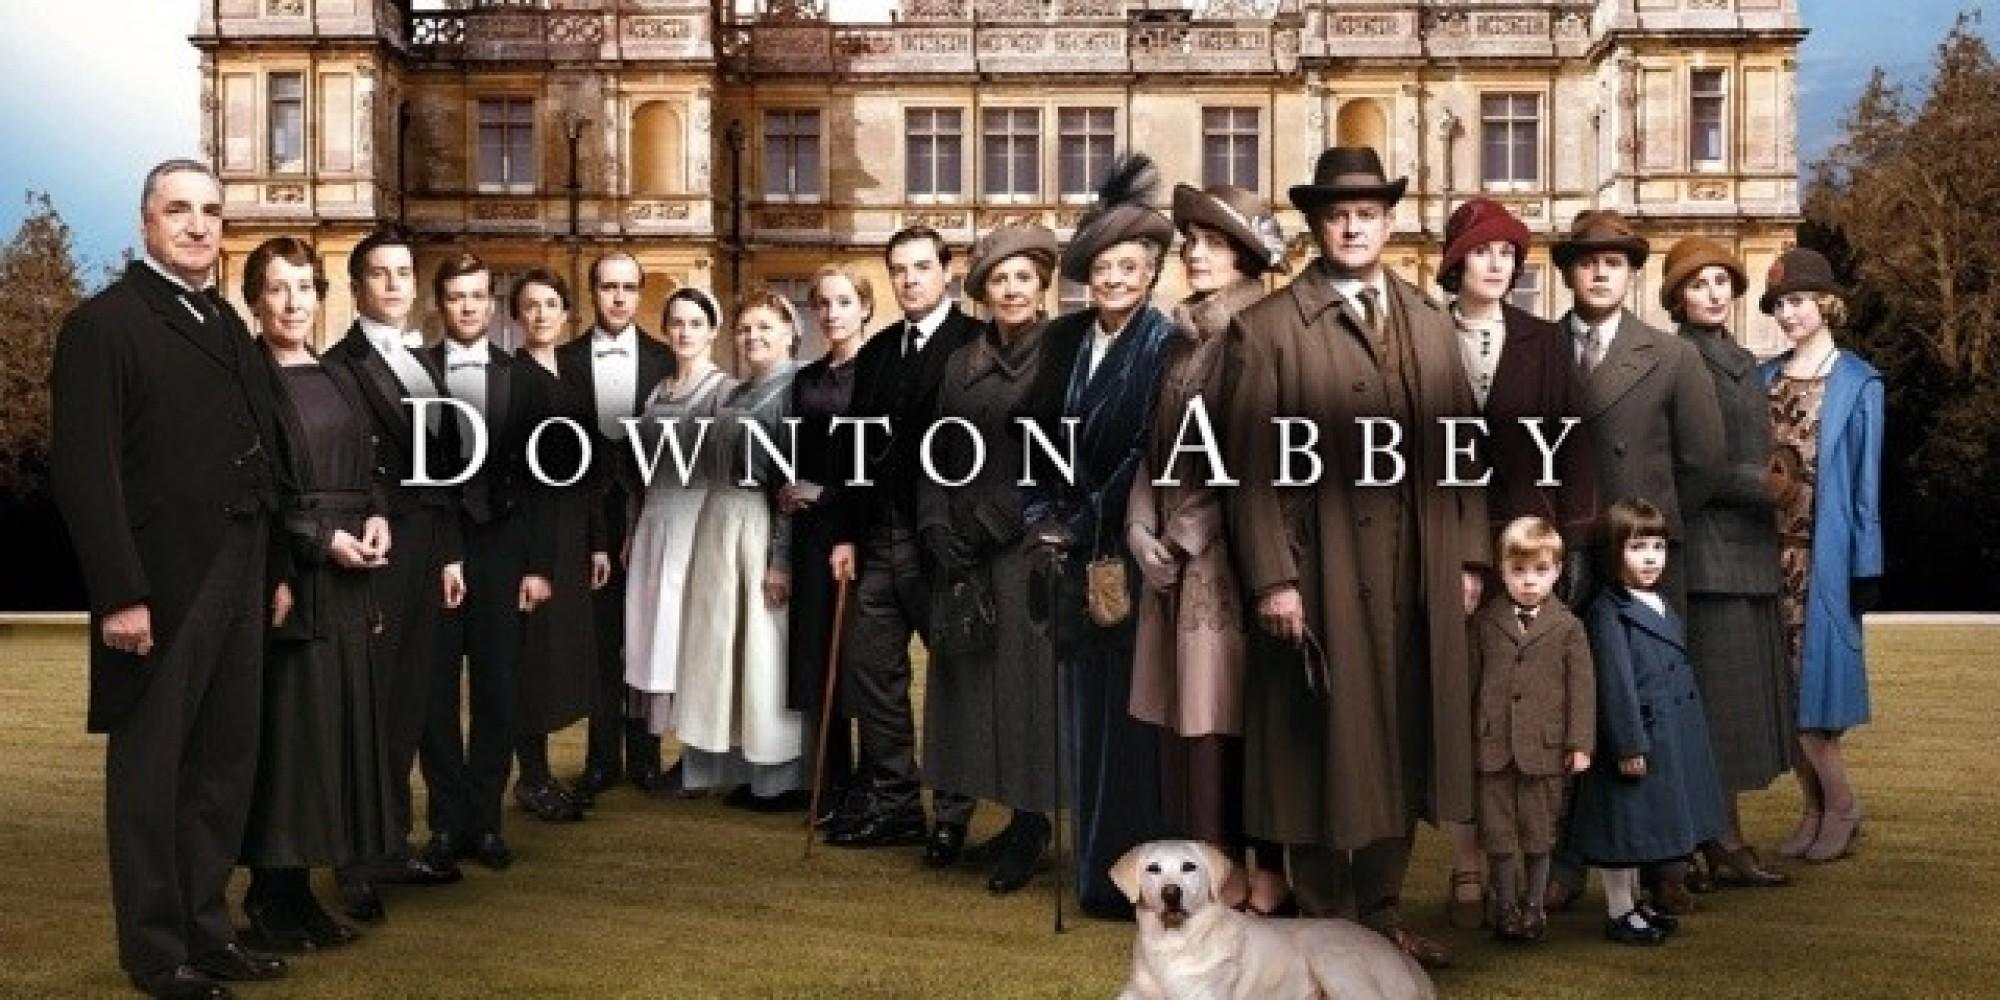 Downton Abbey Season 6 Episode 3 Recap: Mrs. Hughes Blindsided ...